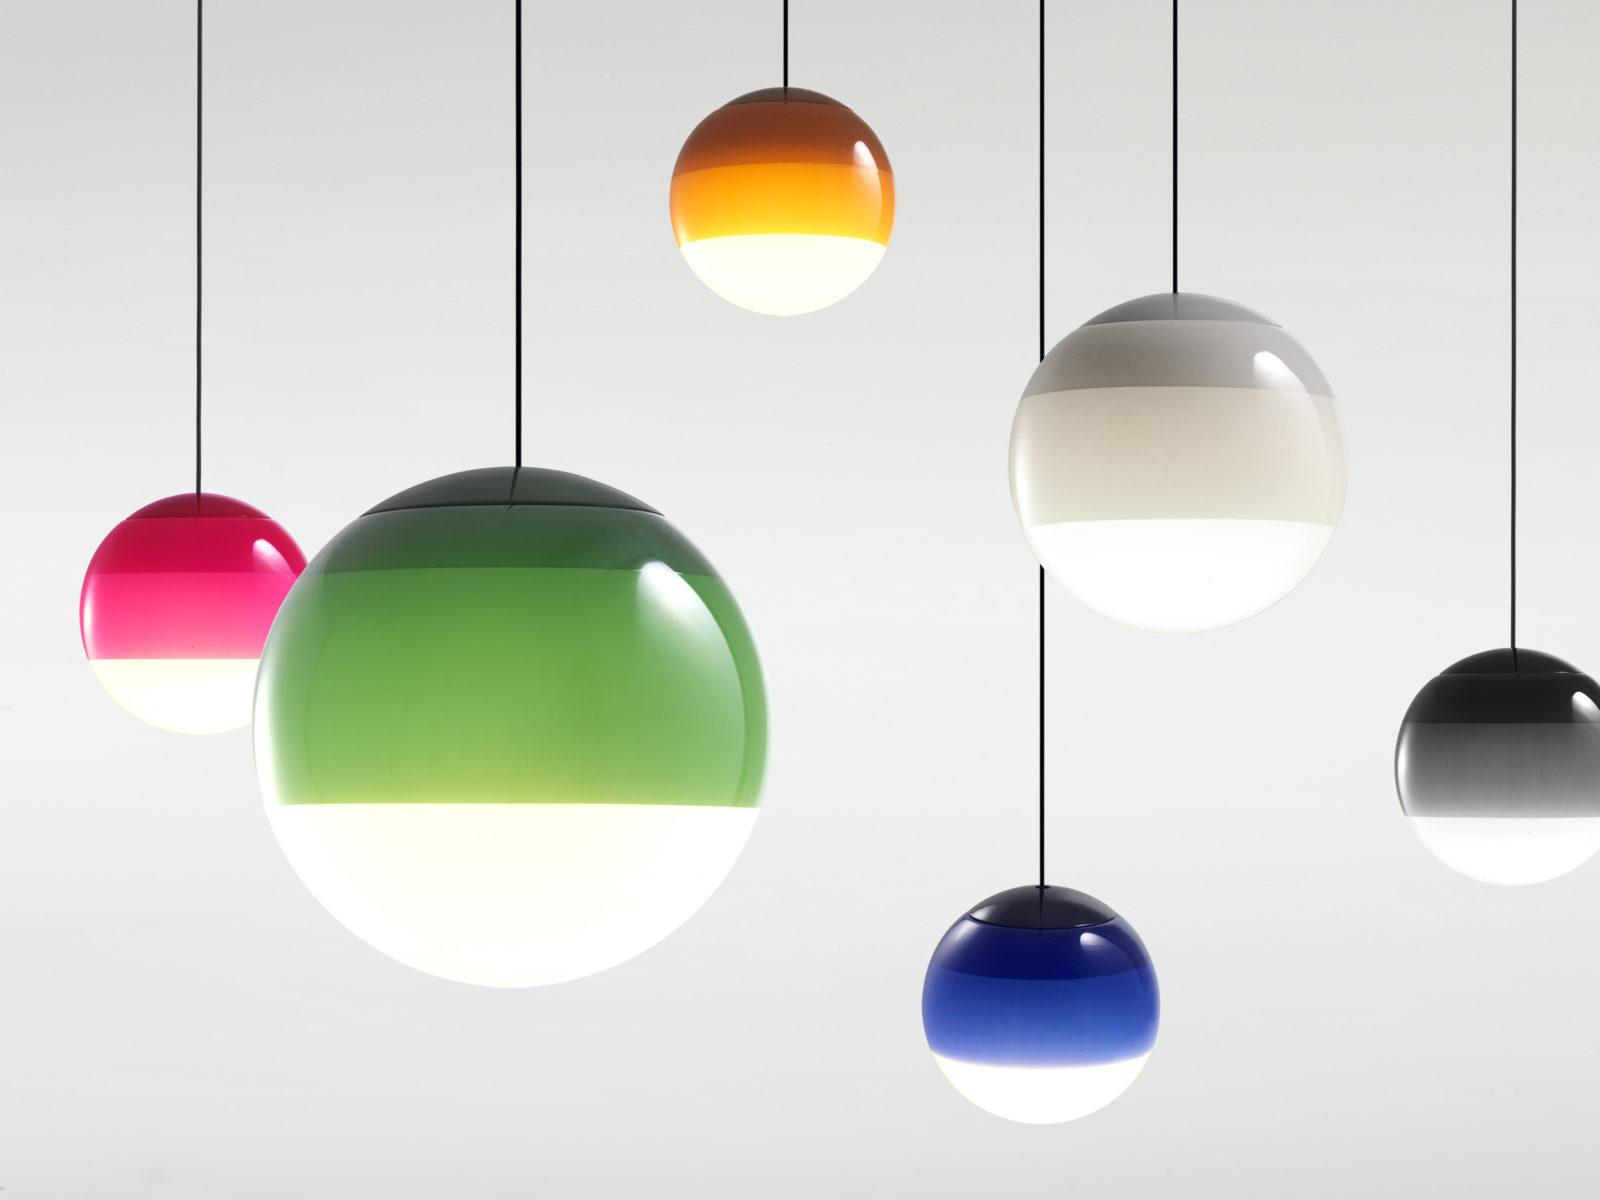 Lámpara de Suspensión - Dipping Light